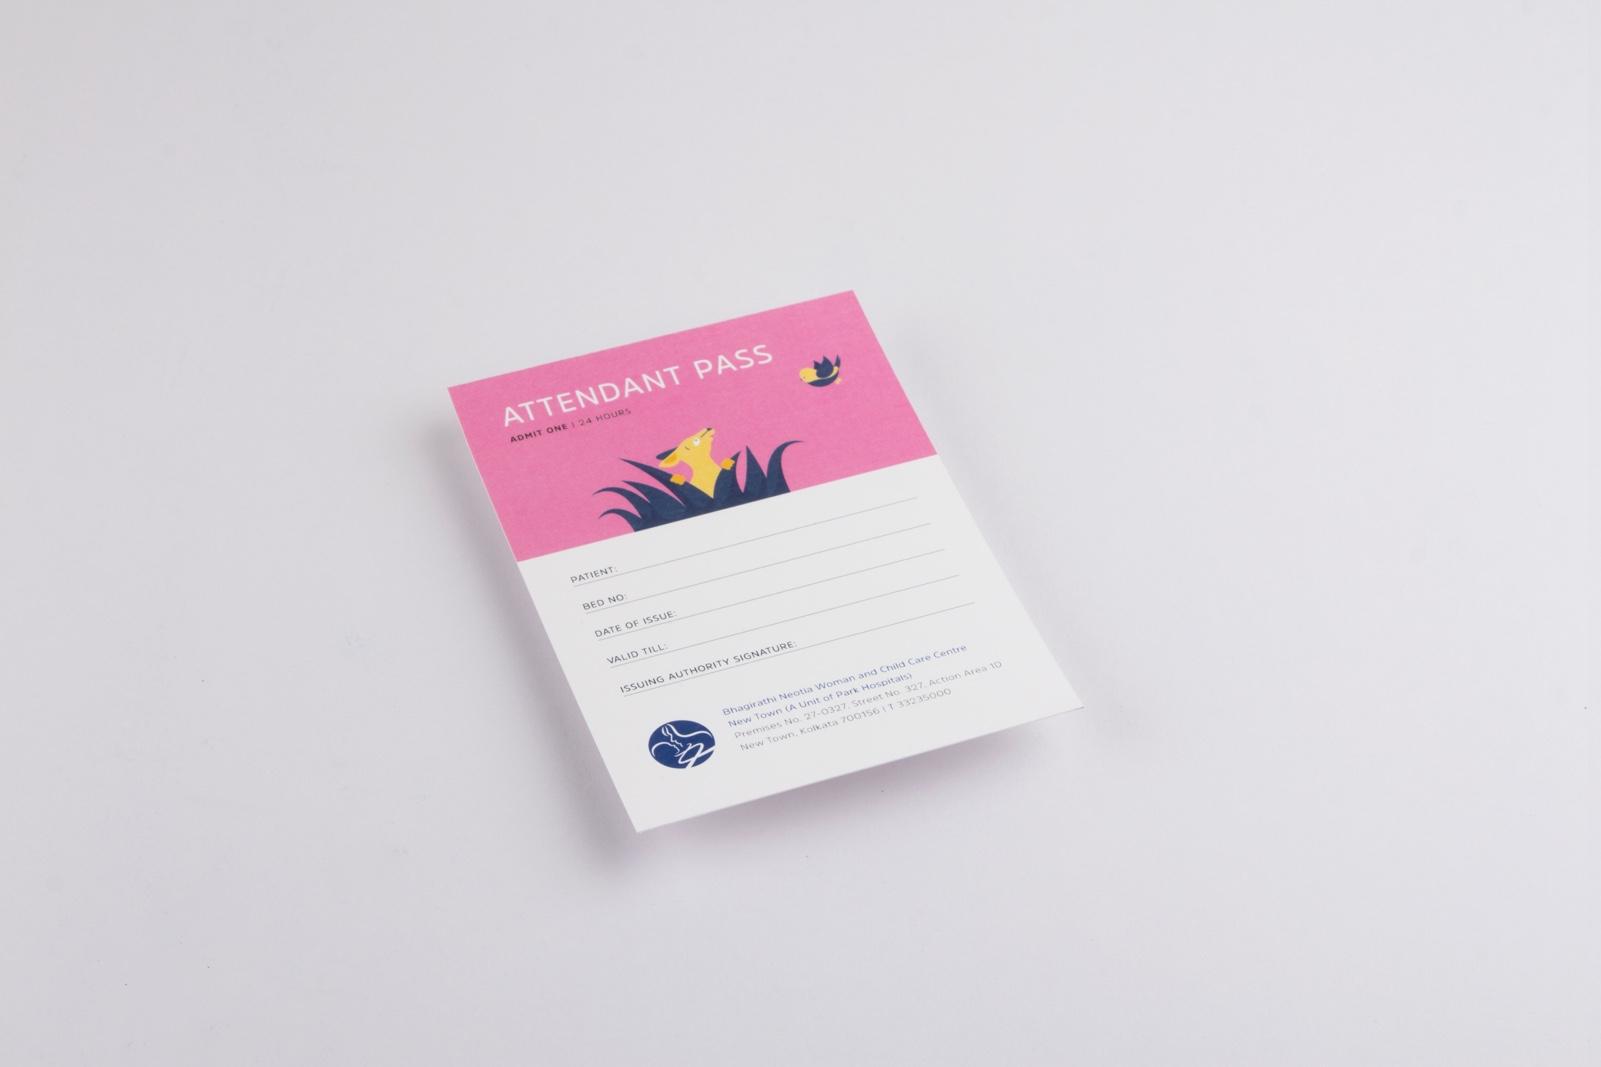 Attendant_Pass